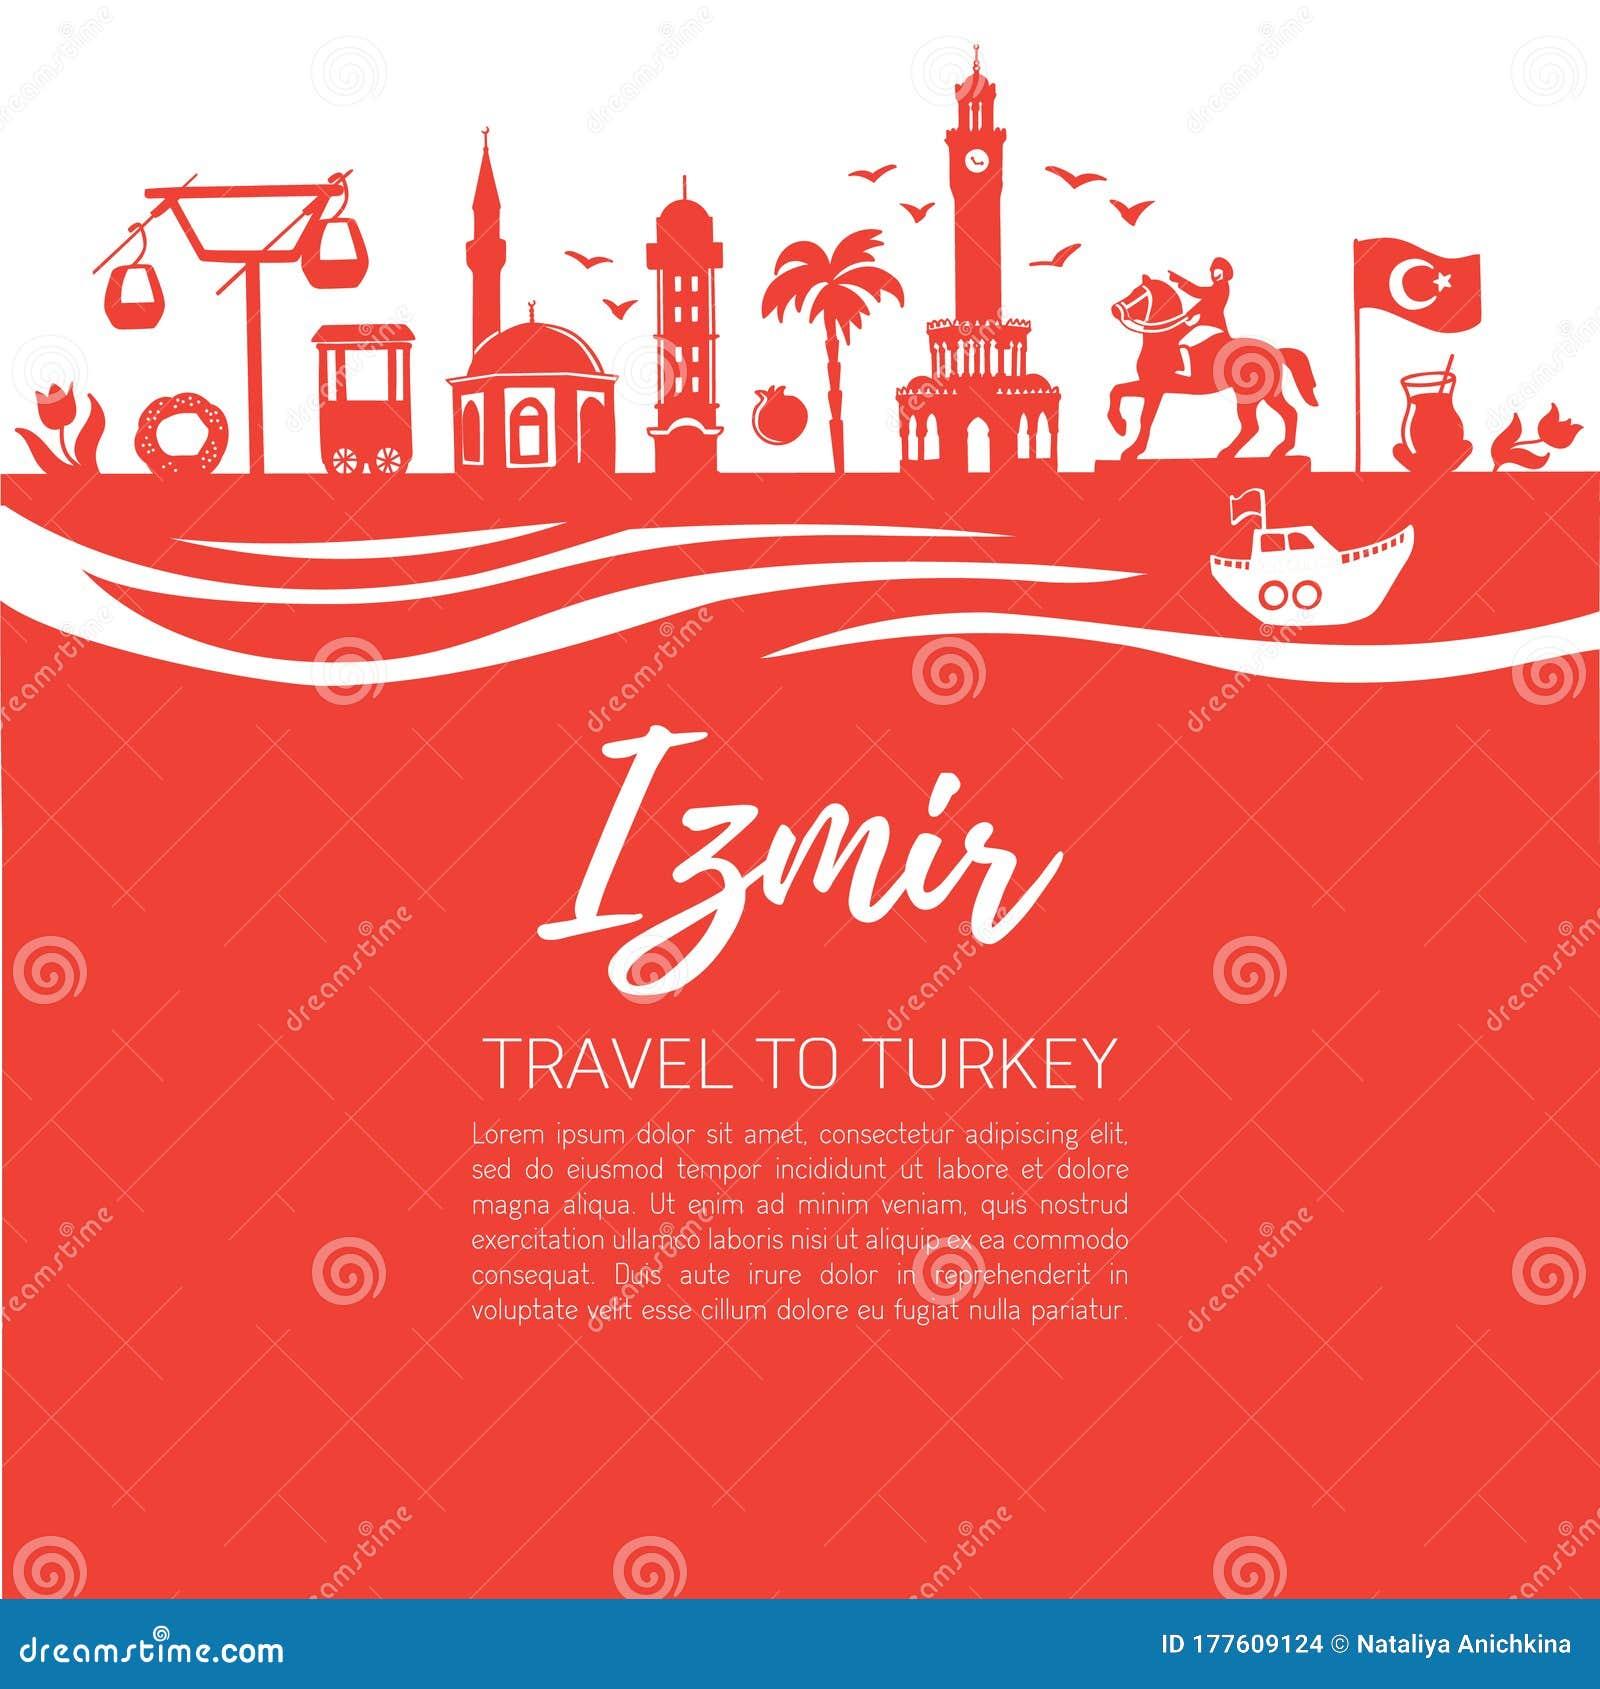 Izmir Travel To Turkey Modern Flat Vector Illustration Of Famous Turkish Landmarks Stock Vector Illustration Of Elevator Black 177609124